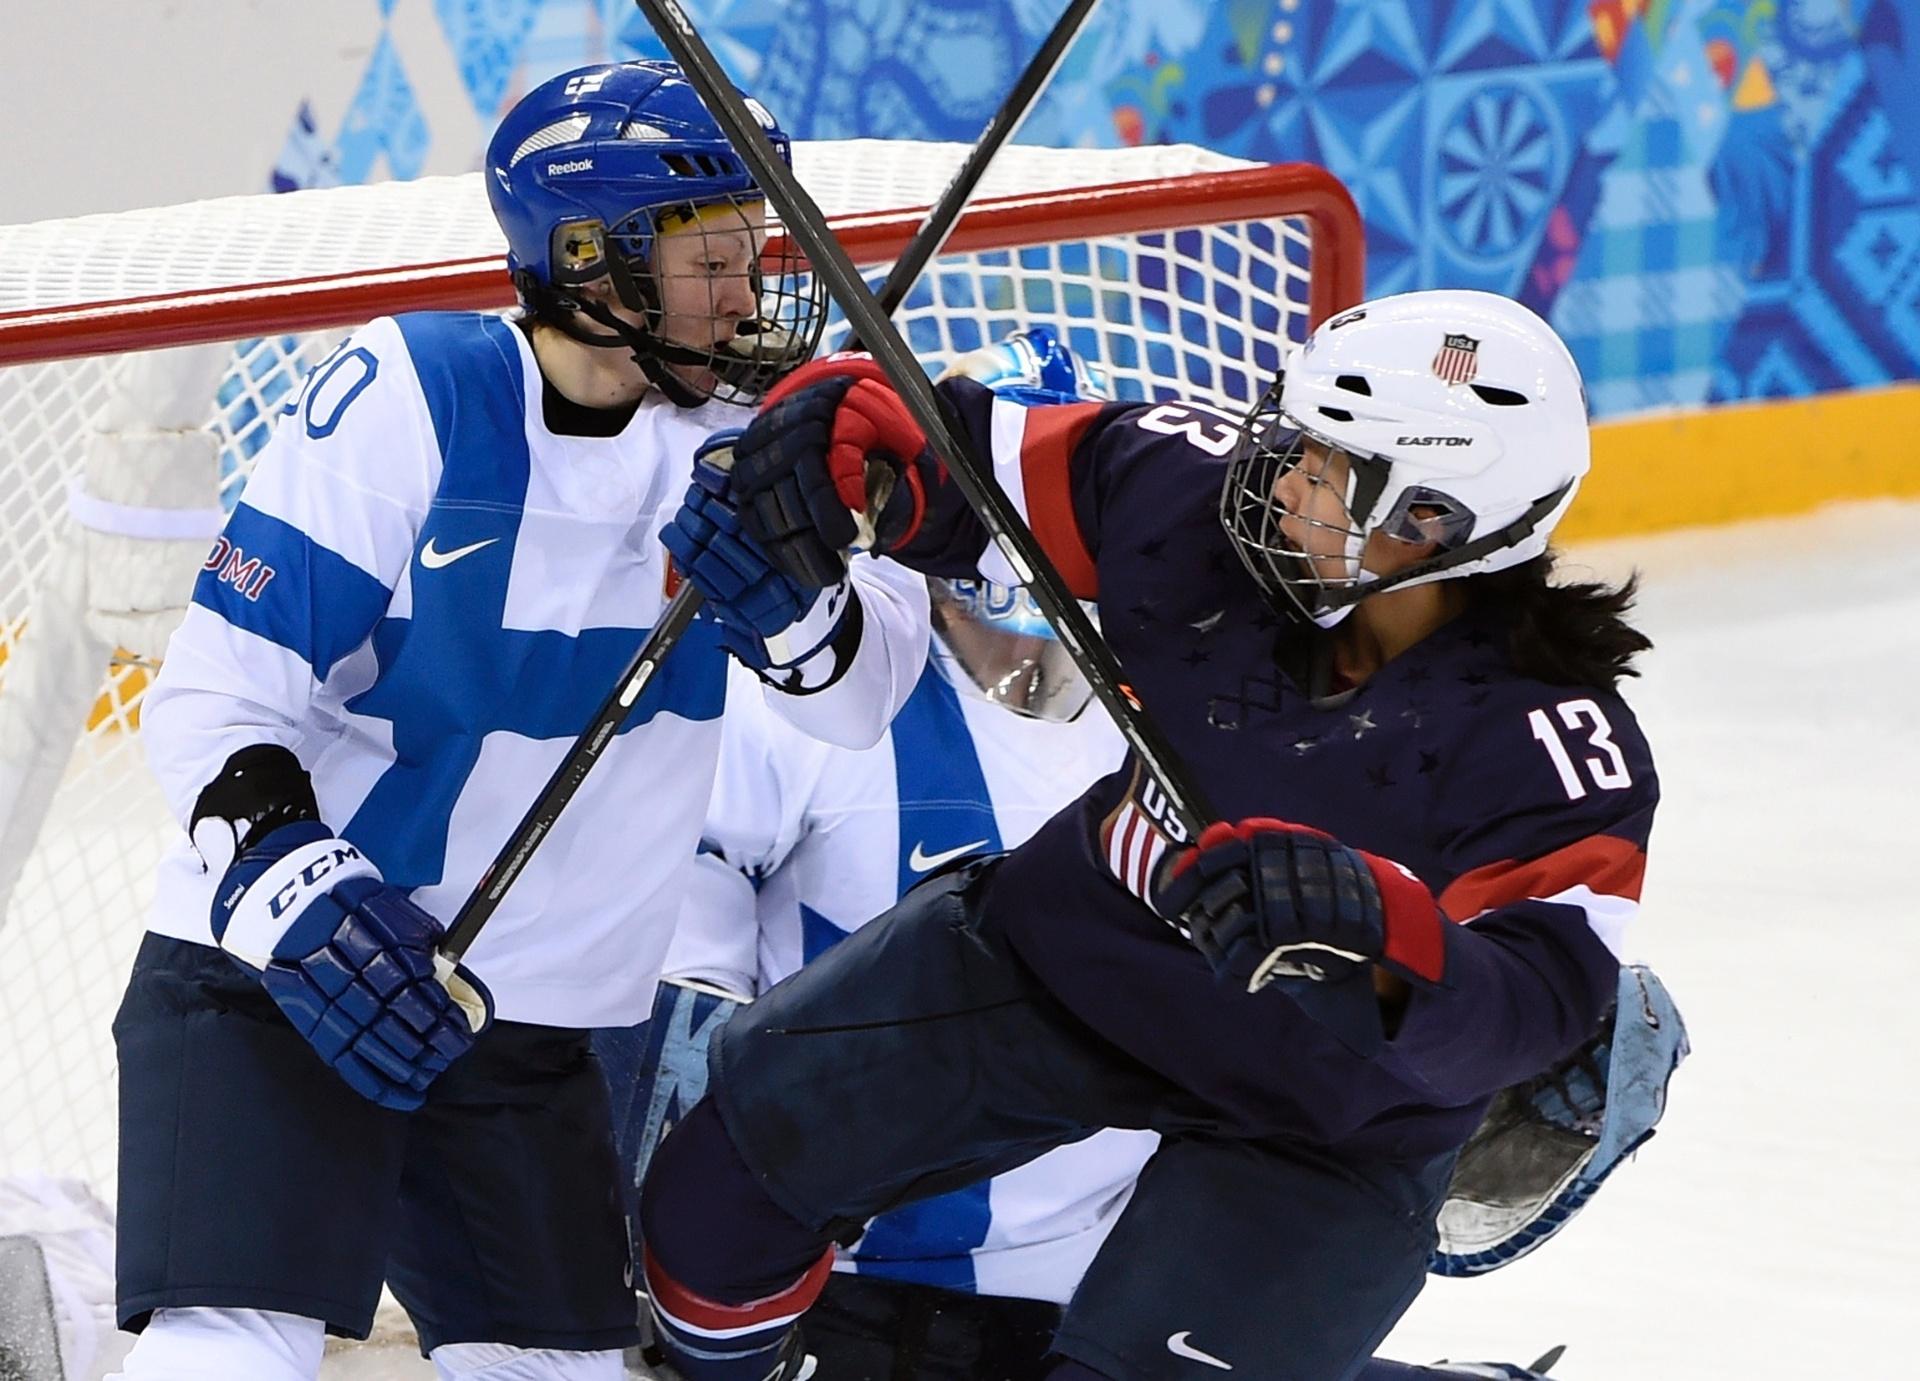 08.02.2014 - Tea Villila e Julie Chu se encaram na partida entre Finlândia e Estados Unidos